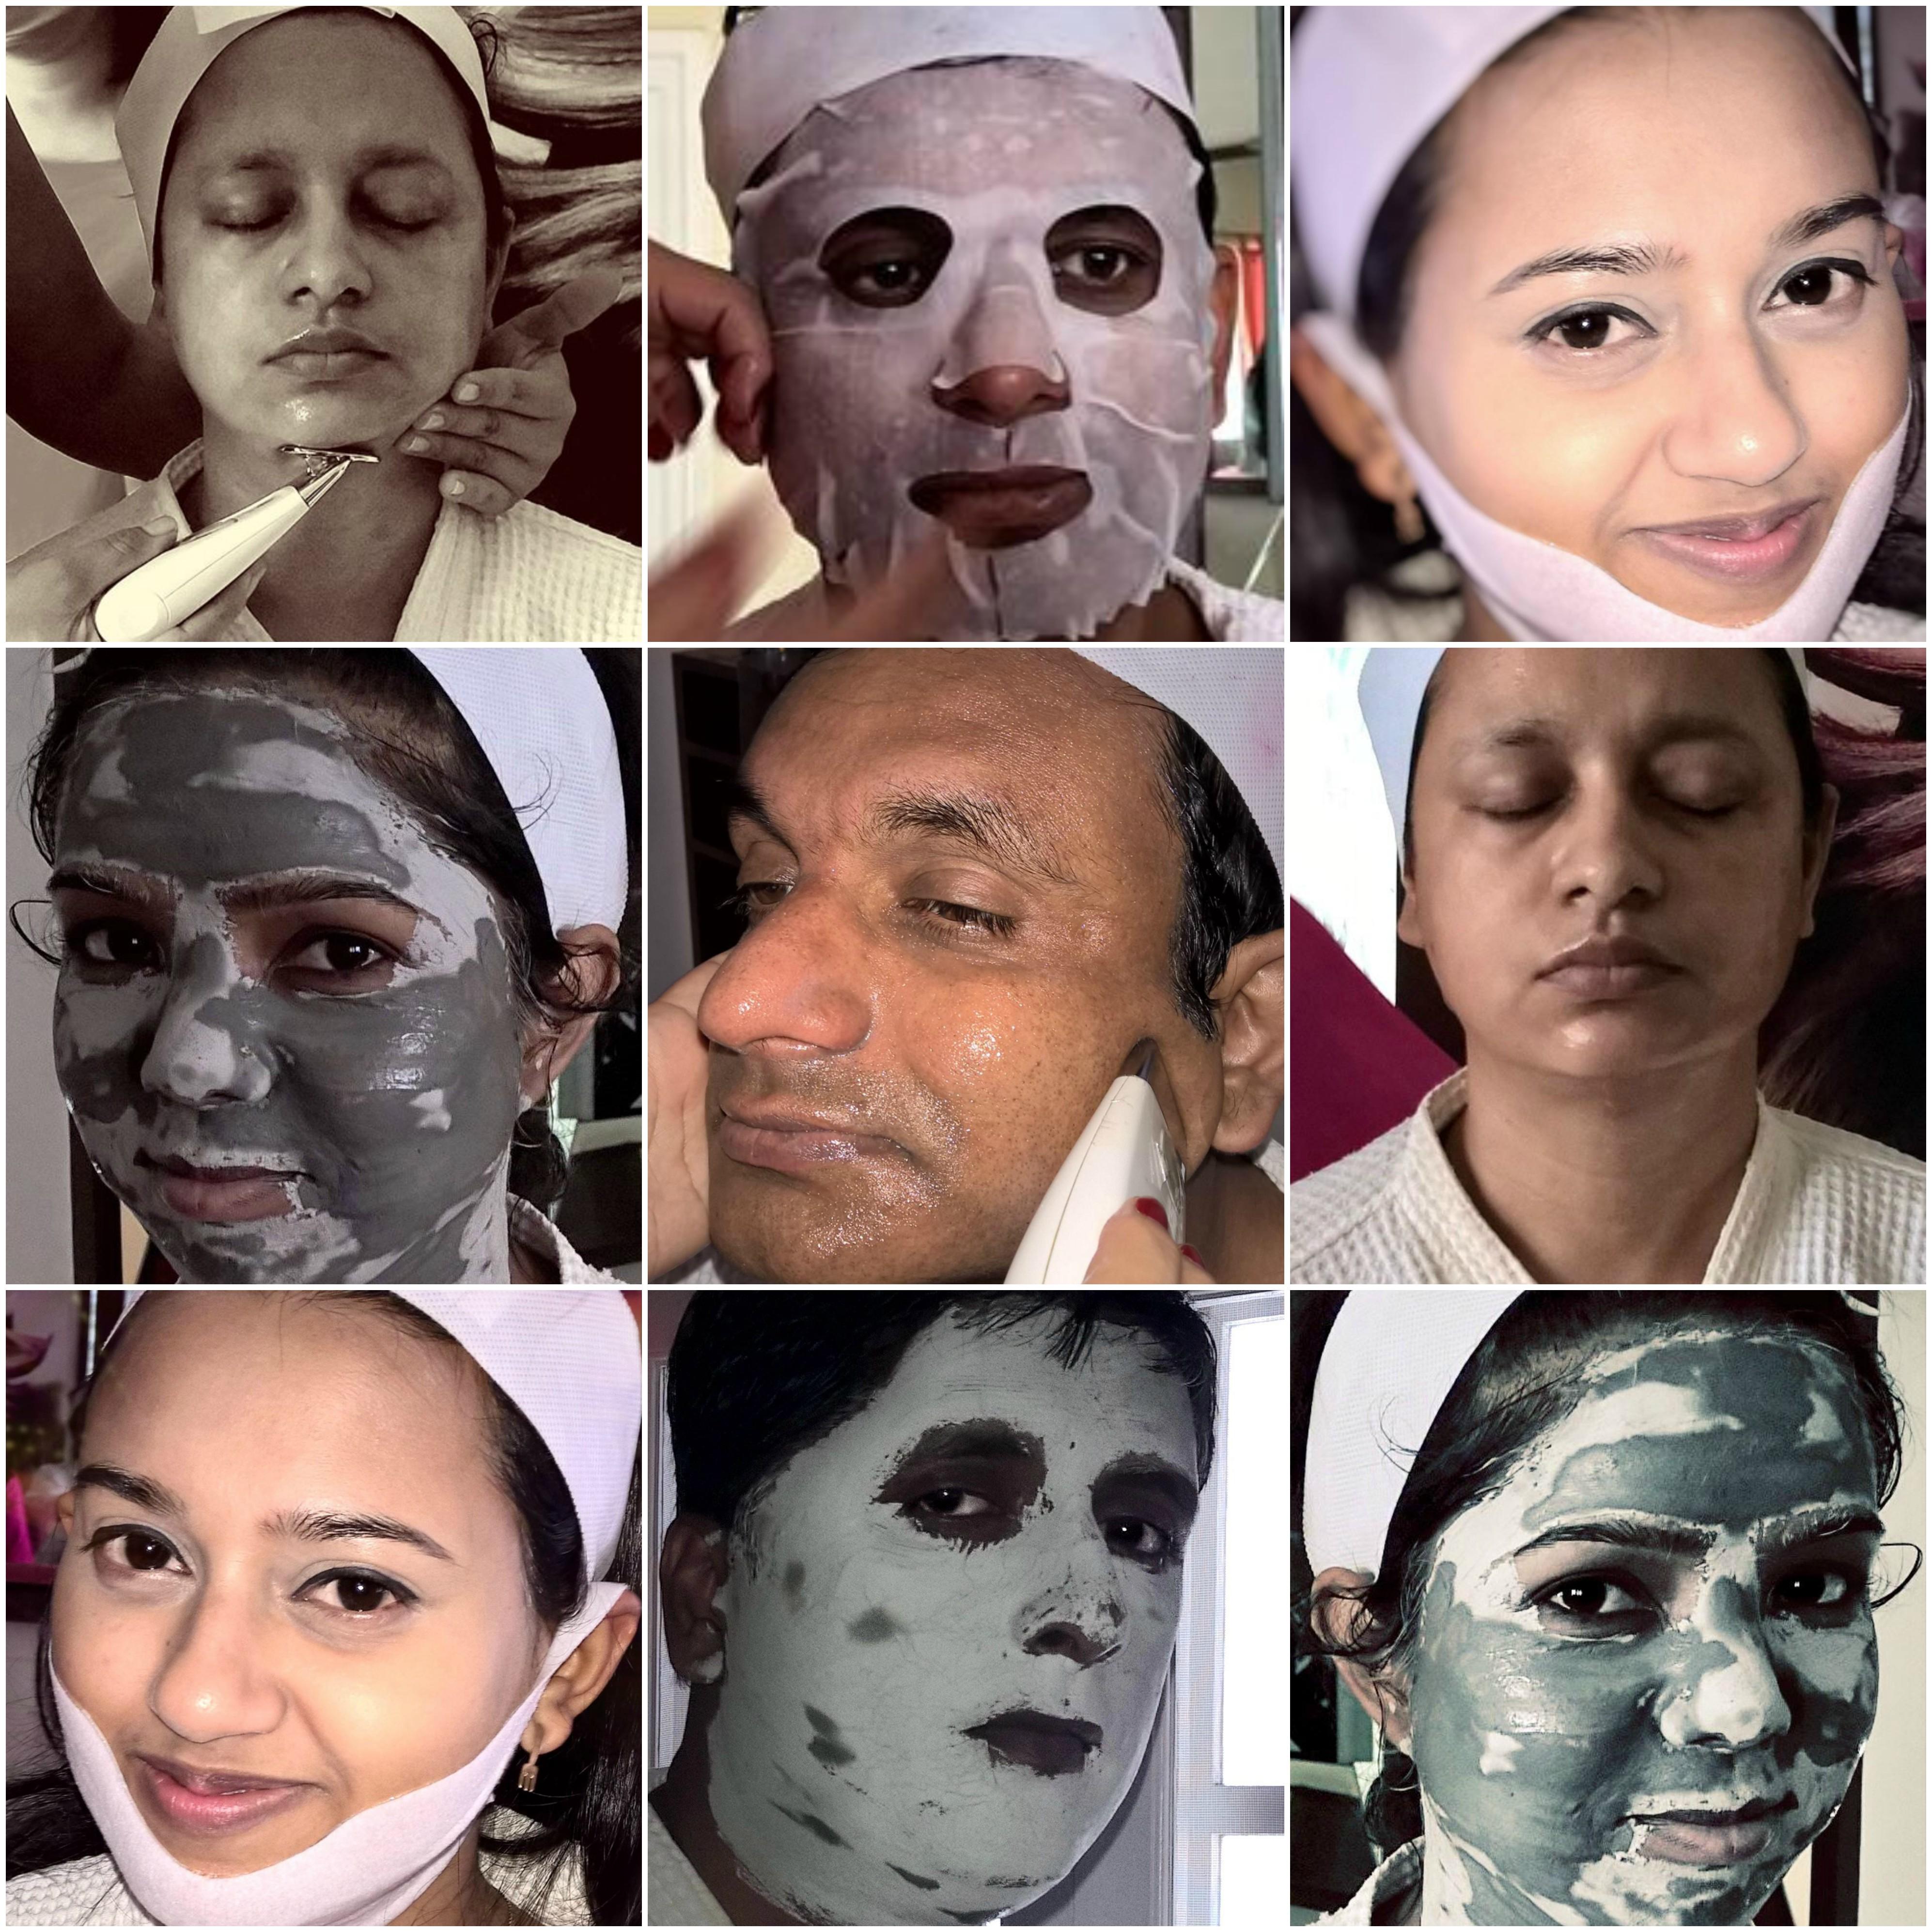 faces Collage Ema Spa